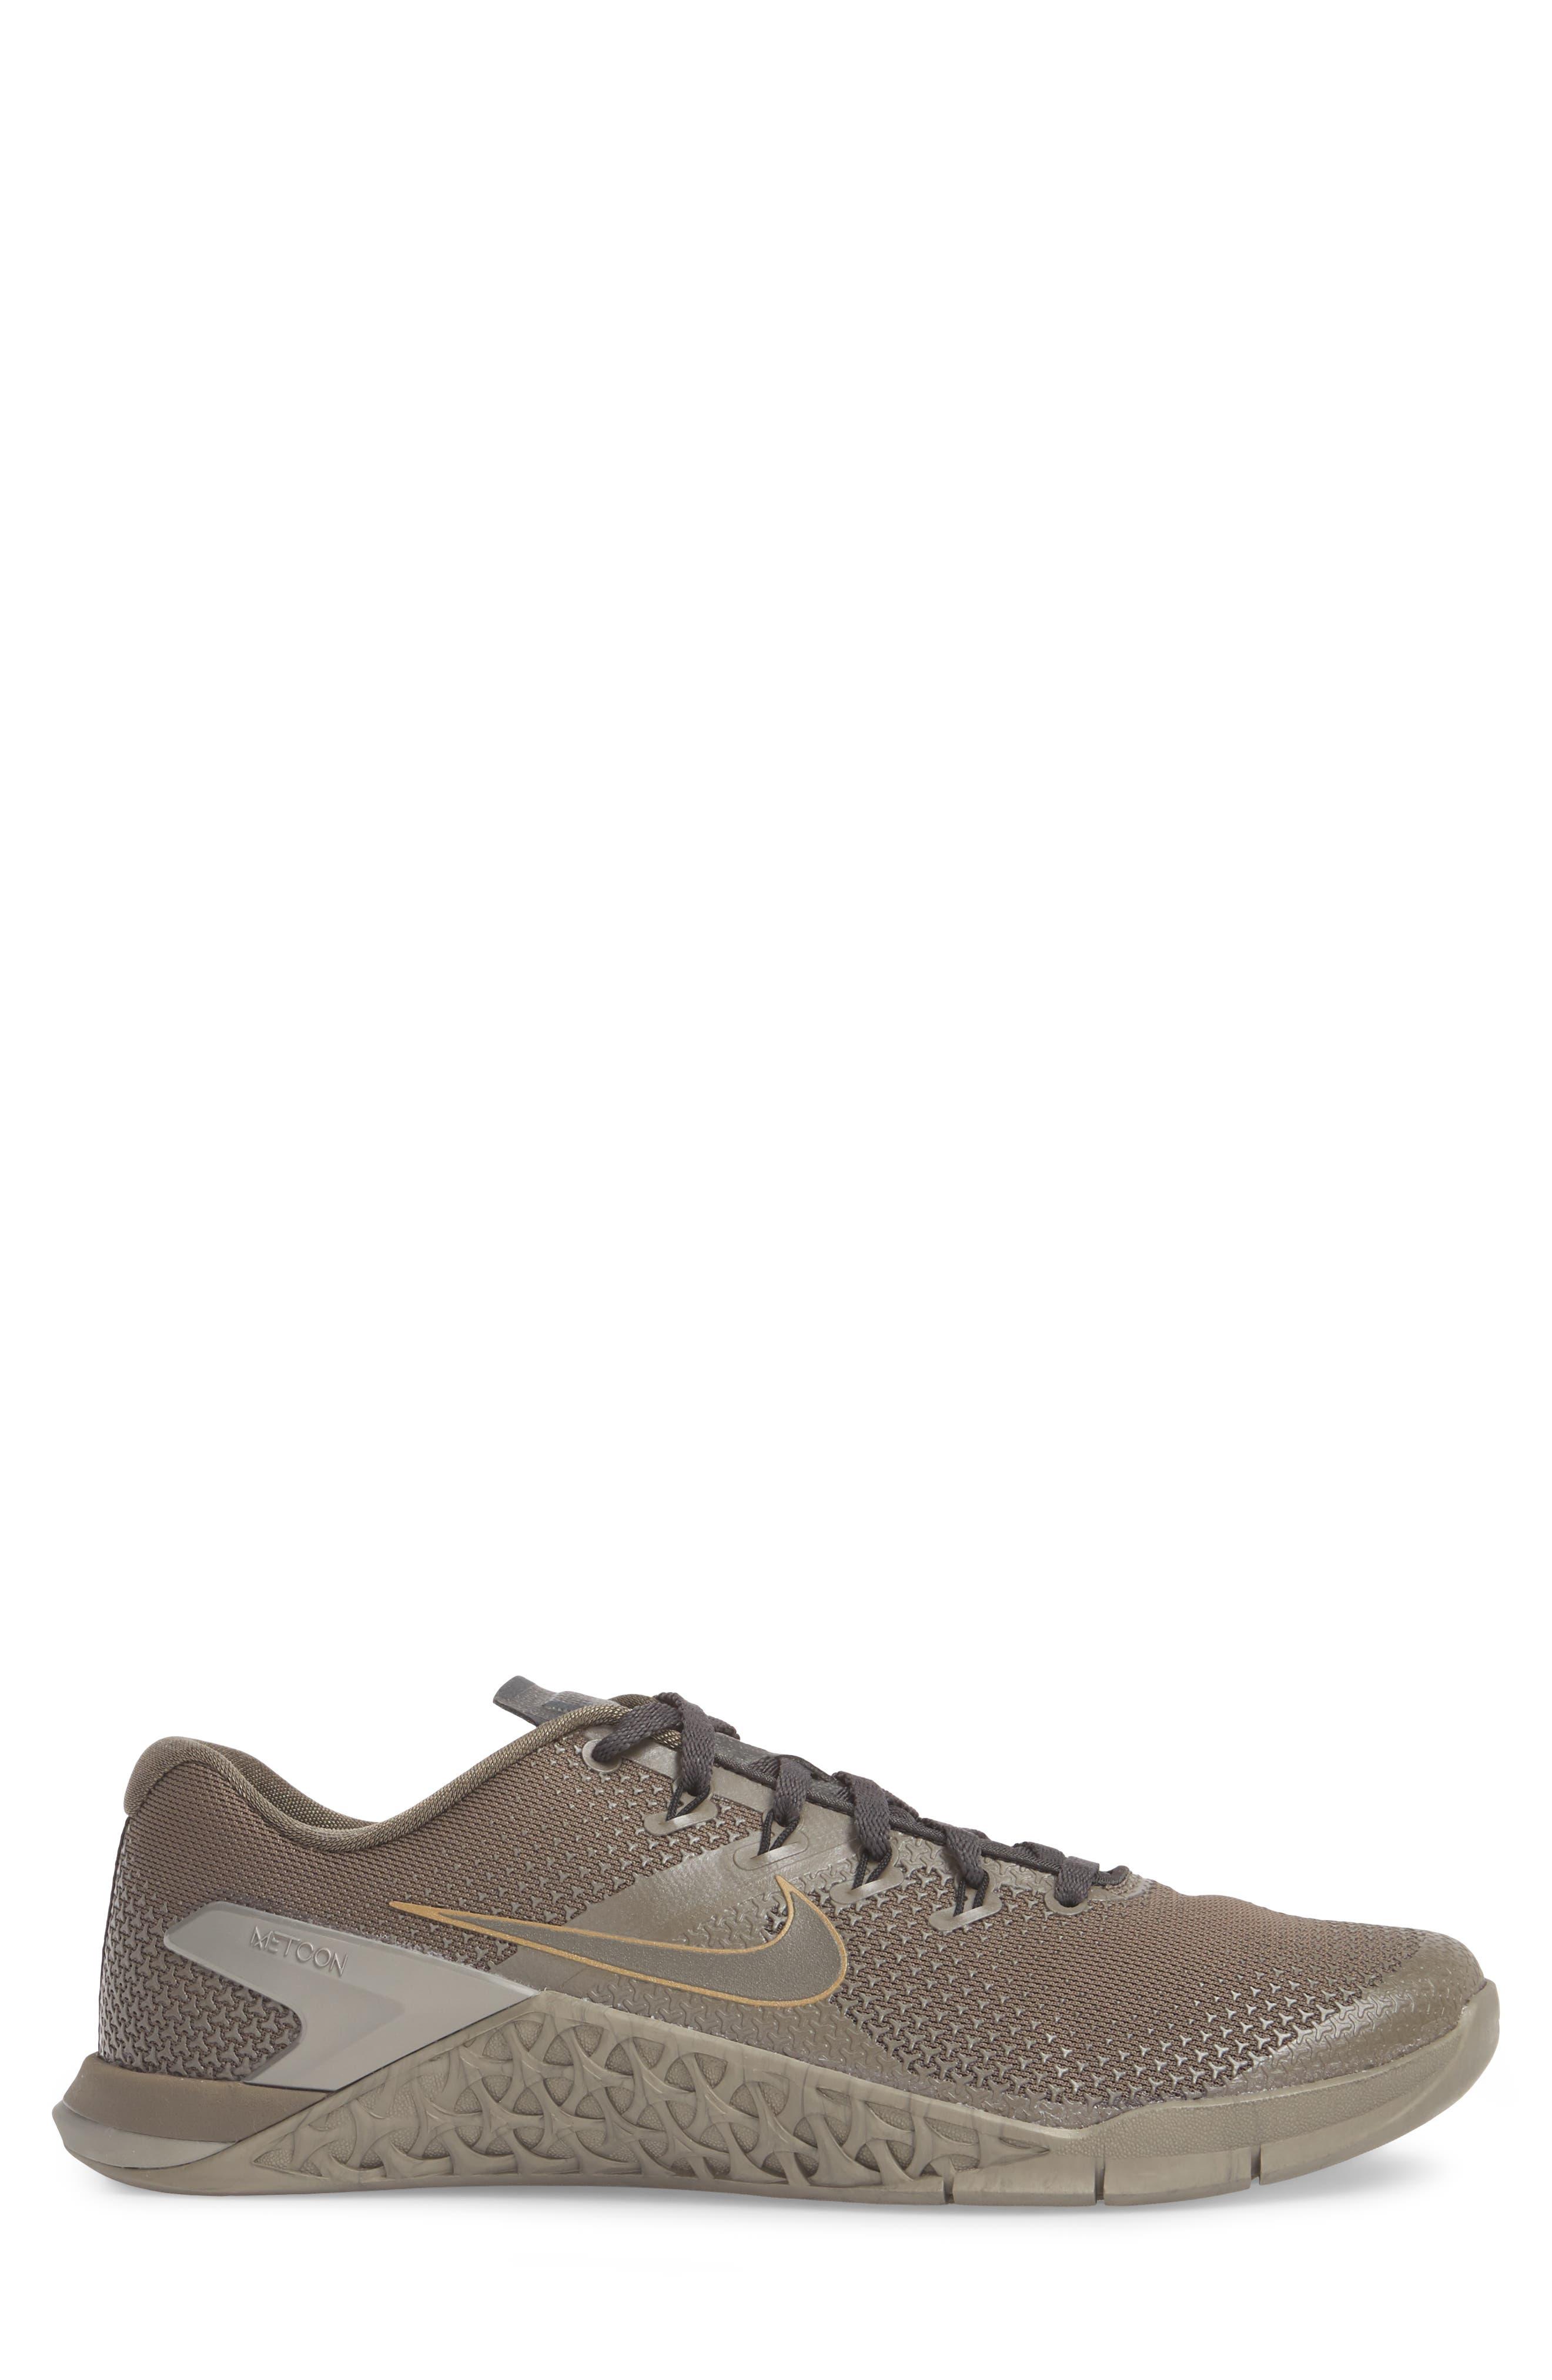 Metcon 4 Viking Quest Training Shoe,                             Alternate thumbnail 3, color,                             Ridgerock/ Pewter/ Anthracite